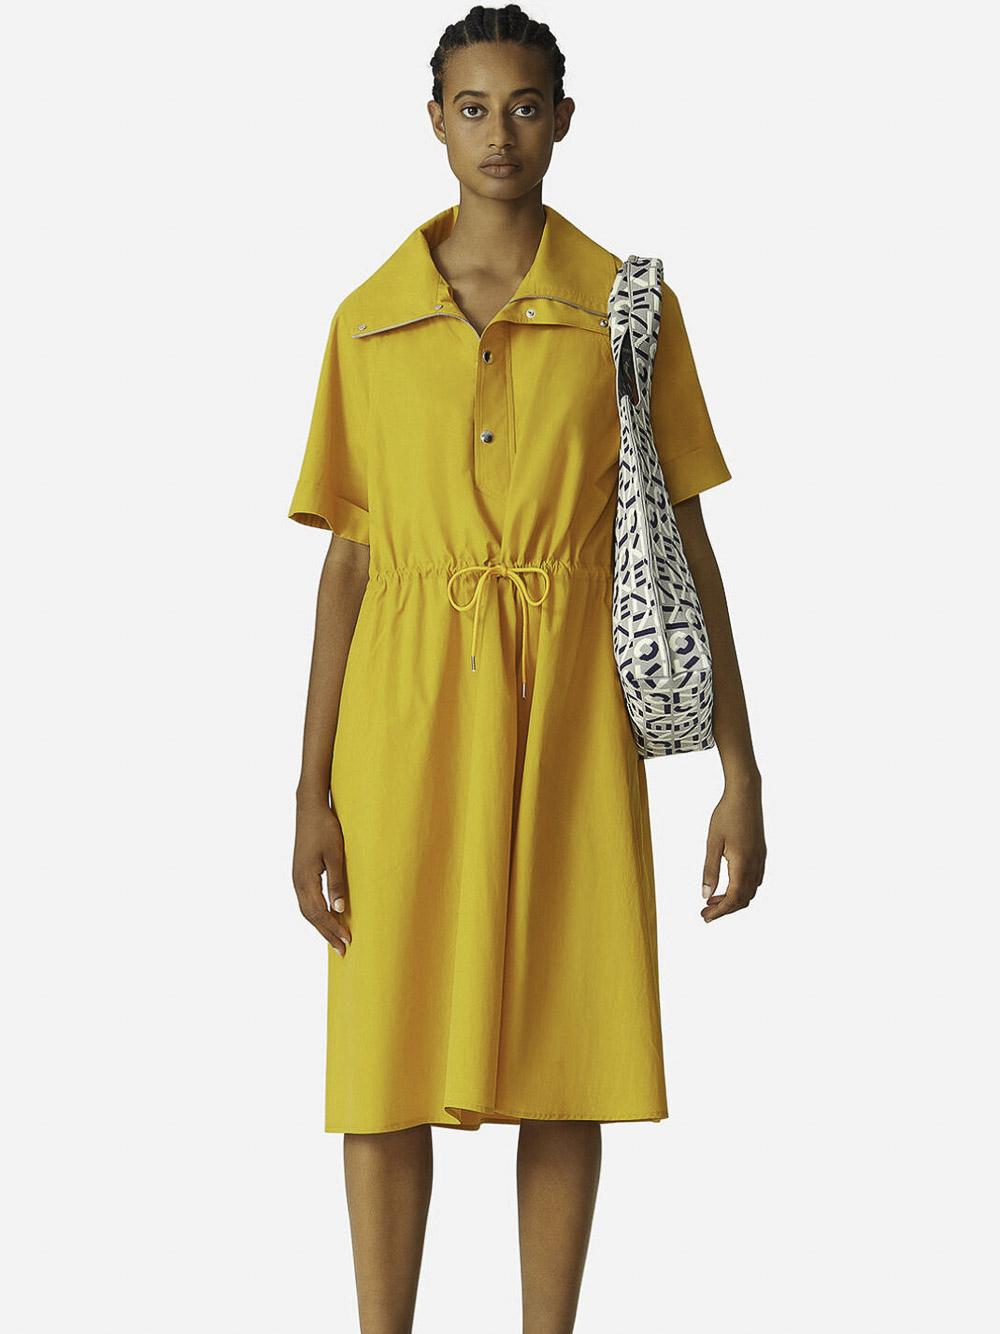 KENZO Φόρεμα μακρύ 2RO0269SA-41 ΚΙΤΡΙΝΟ